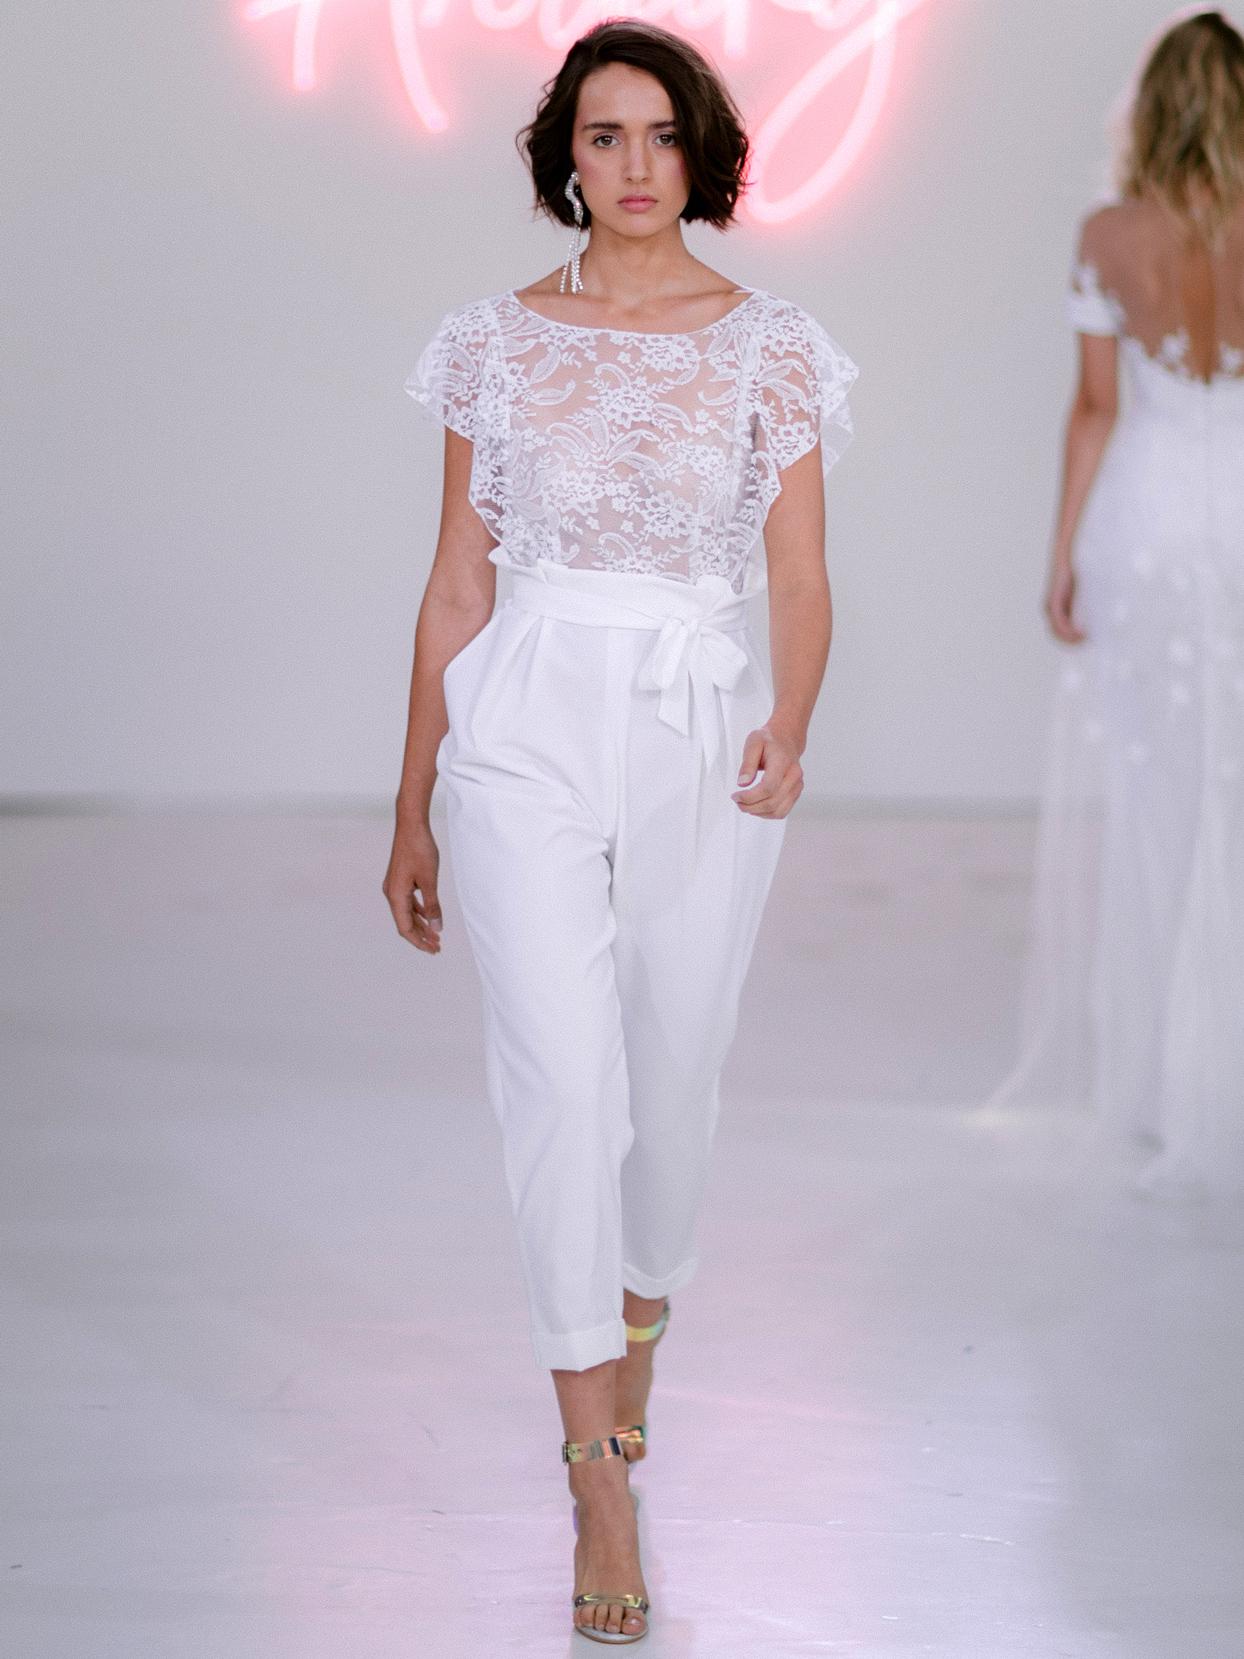 Rime Arodaky X The Mews Bridal sheer lace flutter sleeve bow belt jumpsuit wedding dress fall 2020